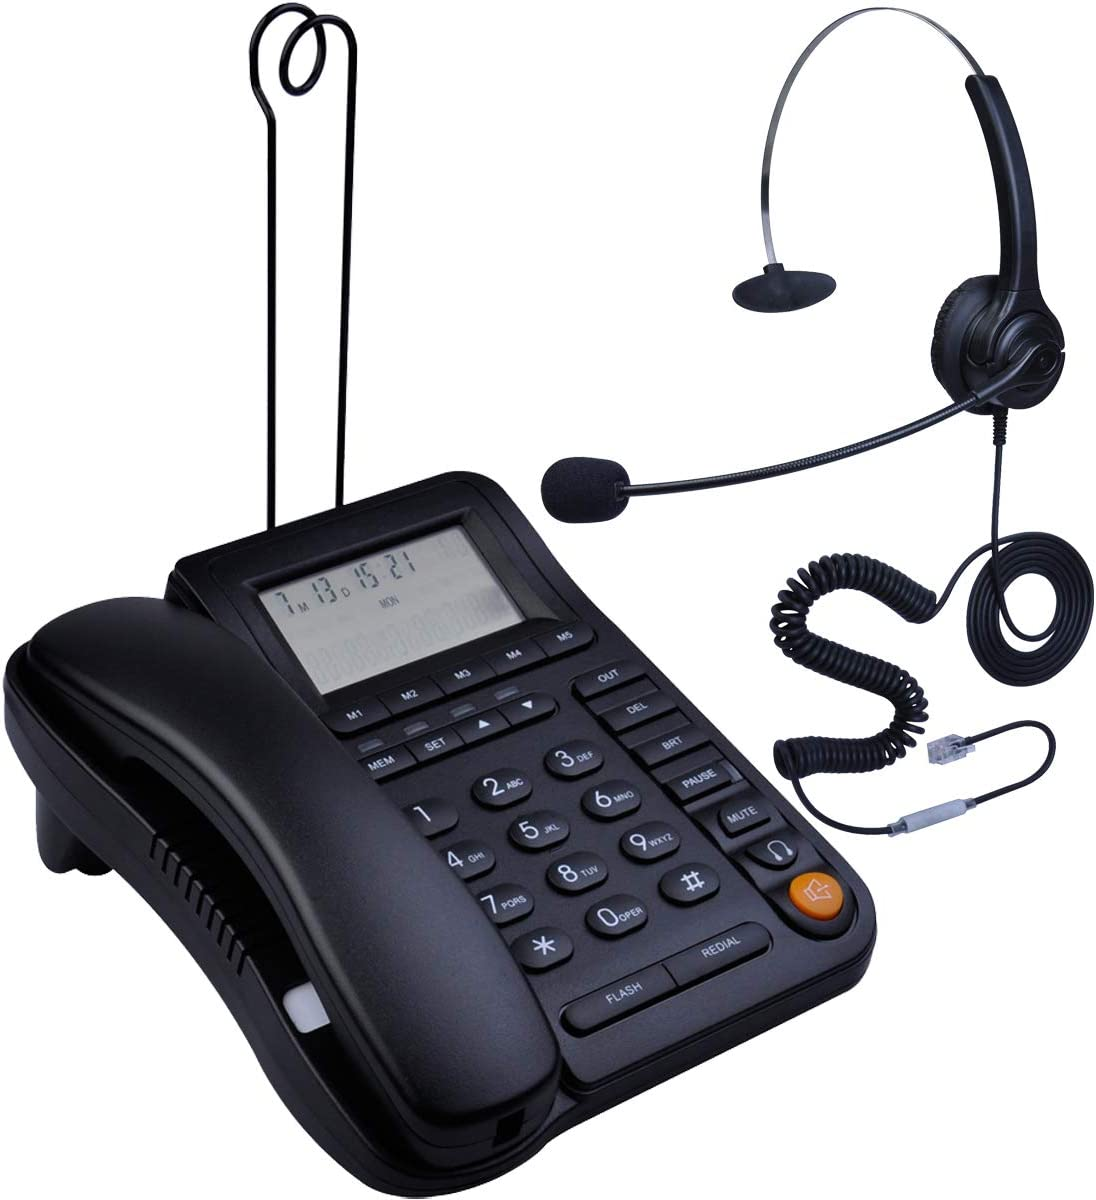 HePesTer P-017BN-2 Call Center Corded Phone with Headset Caller ID Speakerphone Home Office Landline Telephone